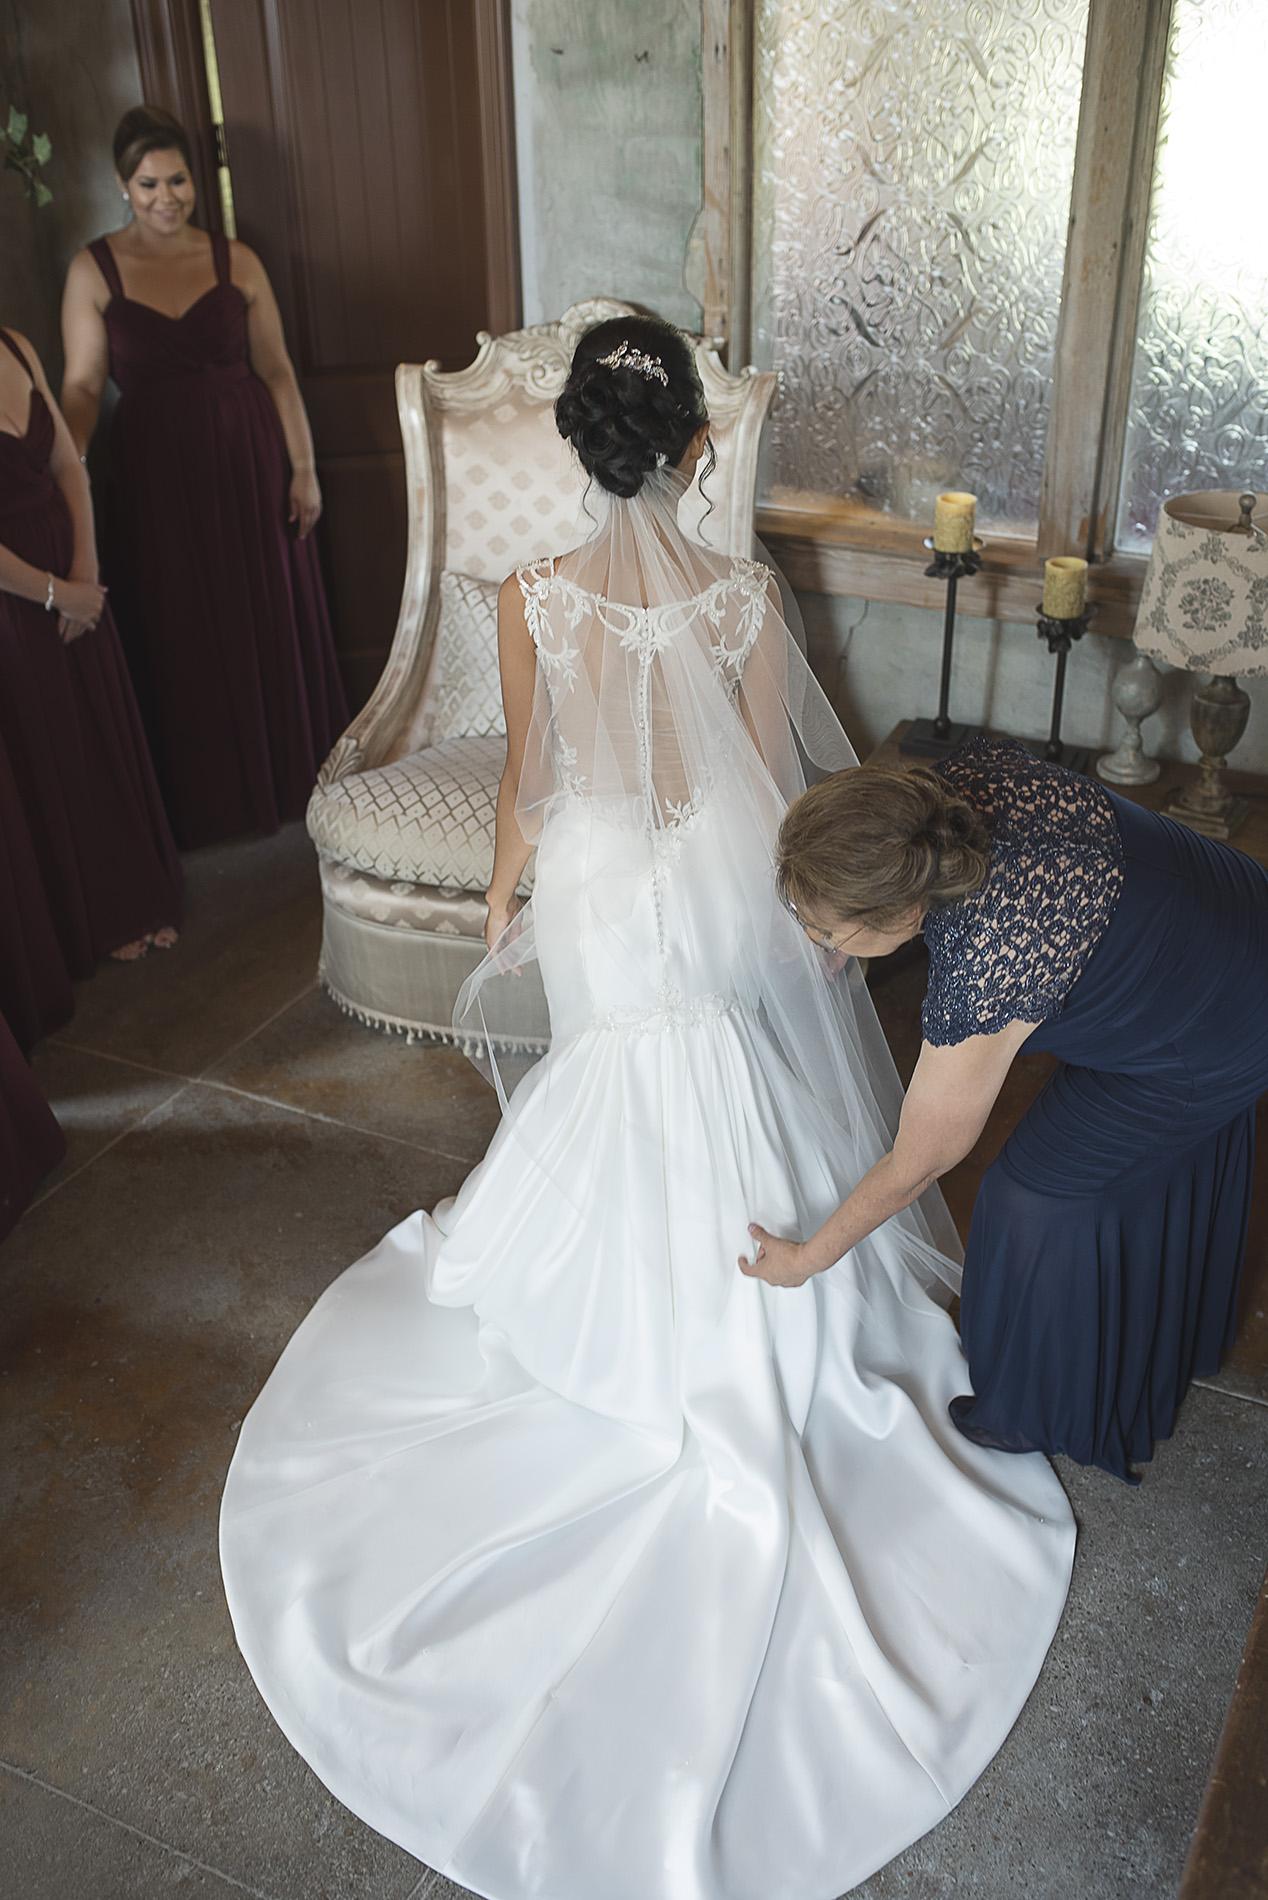 Houston-venue-Olde-Dobbin-Station-Romantic-Classic-Wedding-Photographer-010.jpg